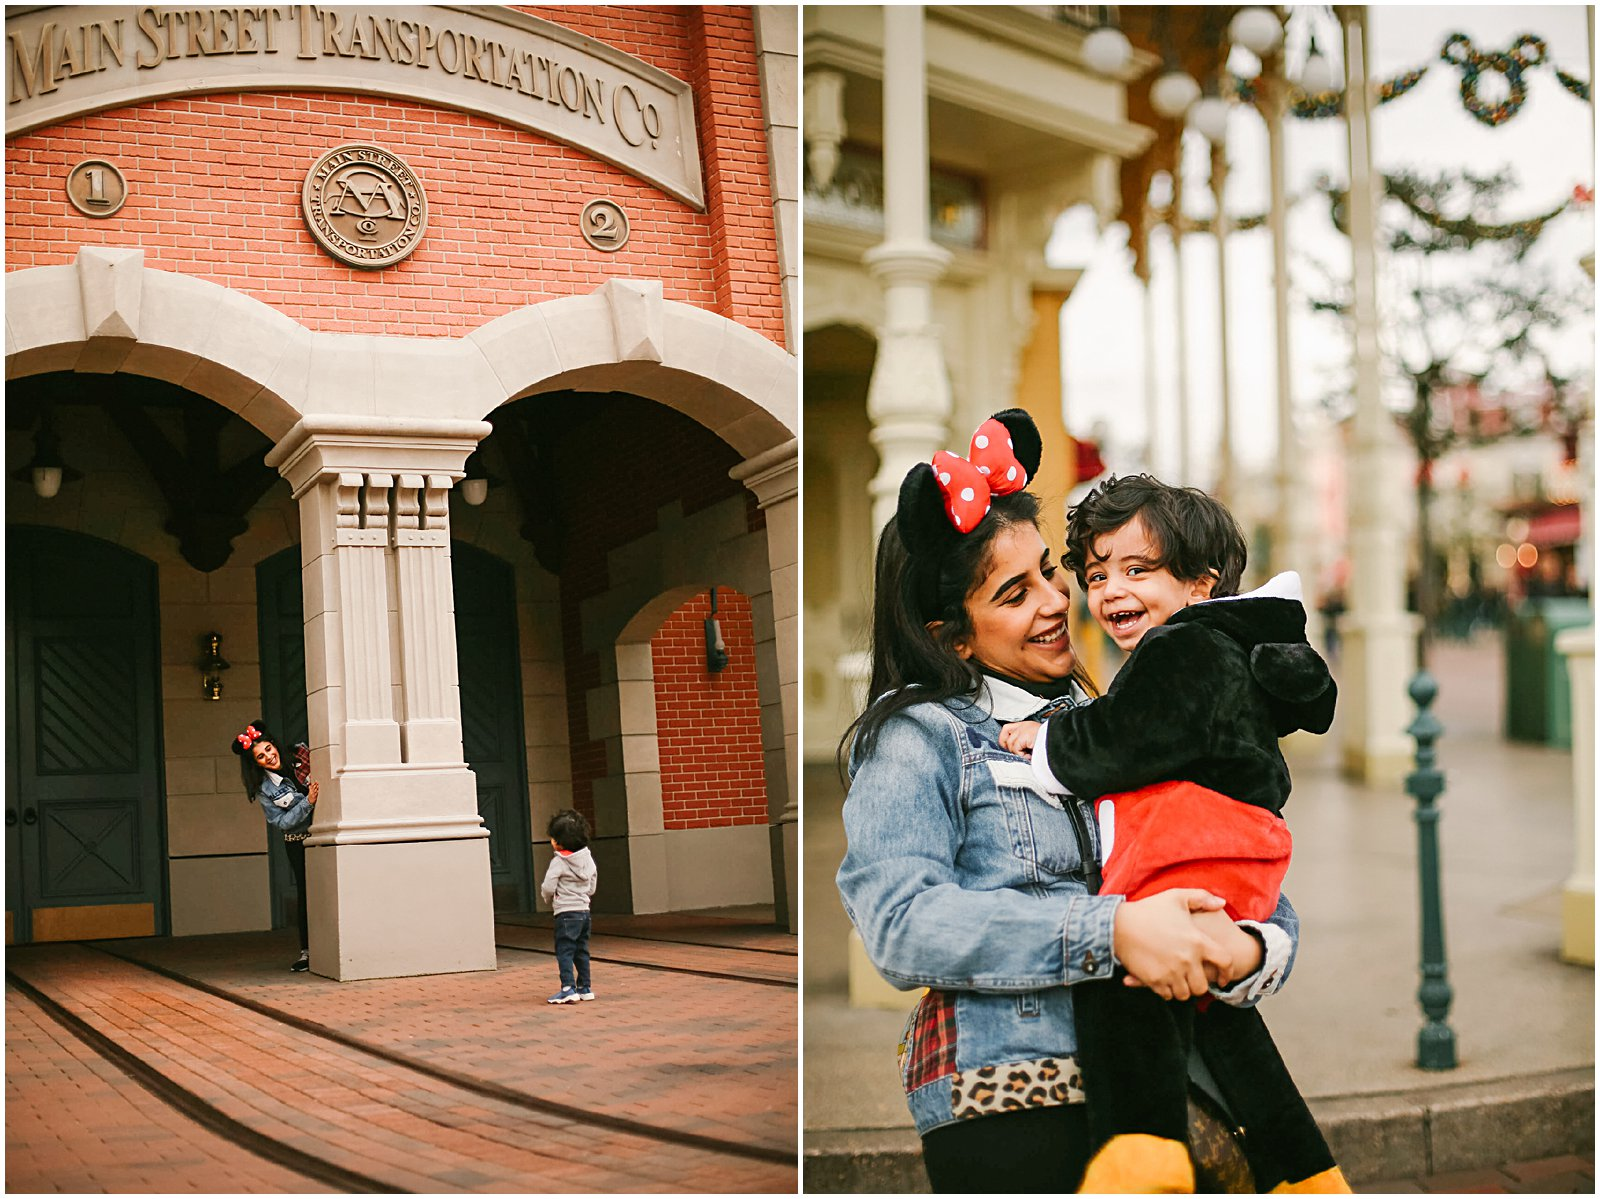 Disneyland Paris Photographer Helena Woods photographs mom and son on Main Street